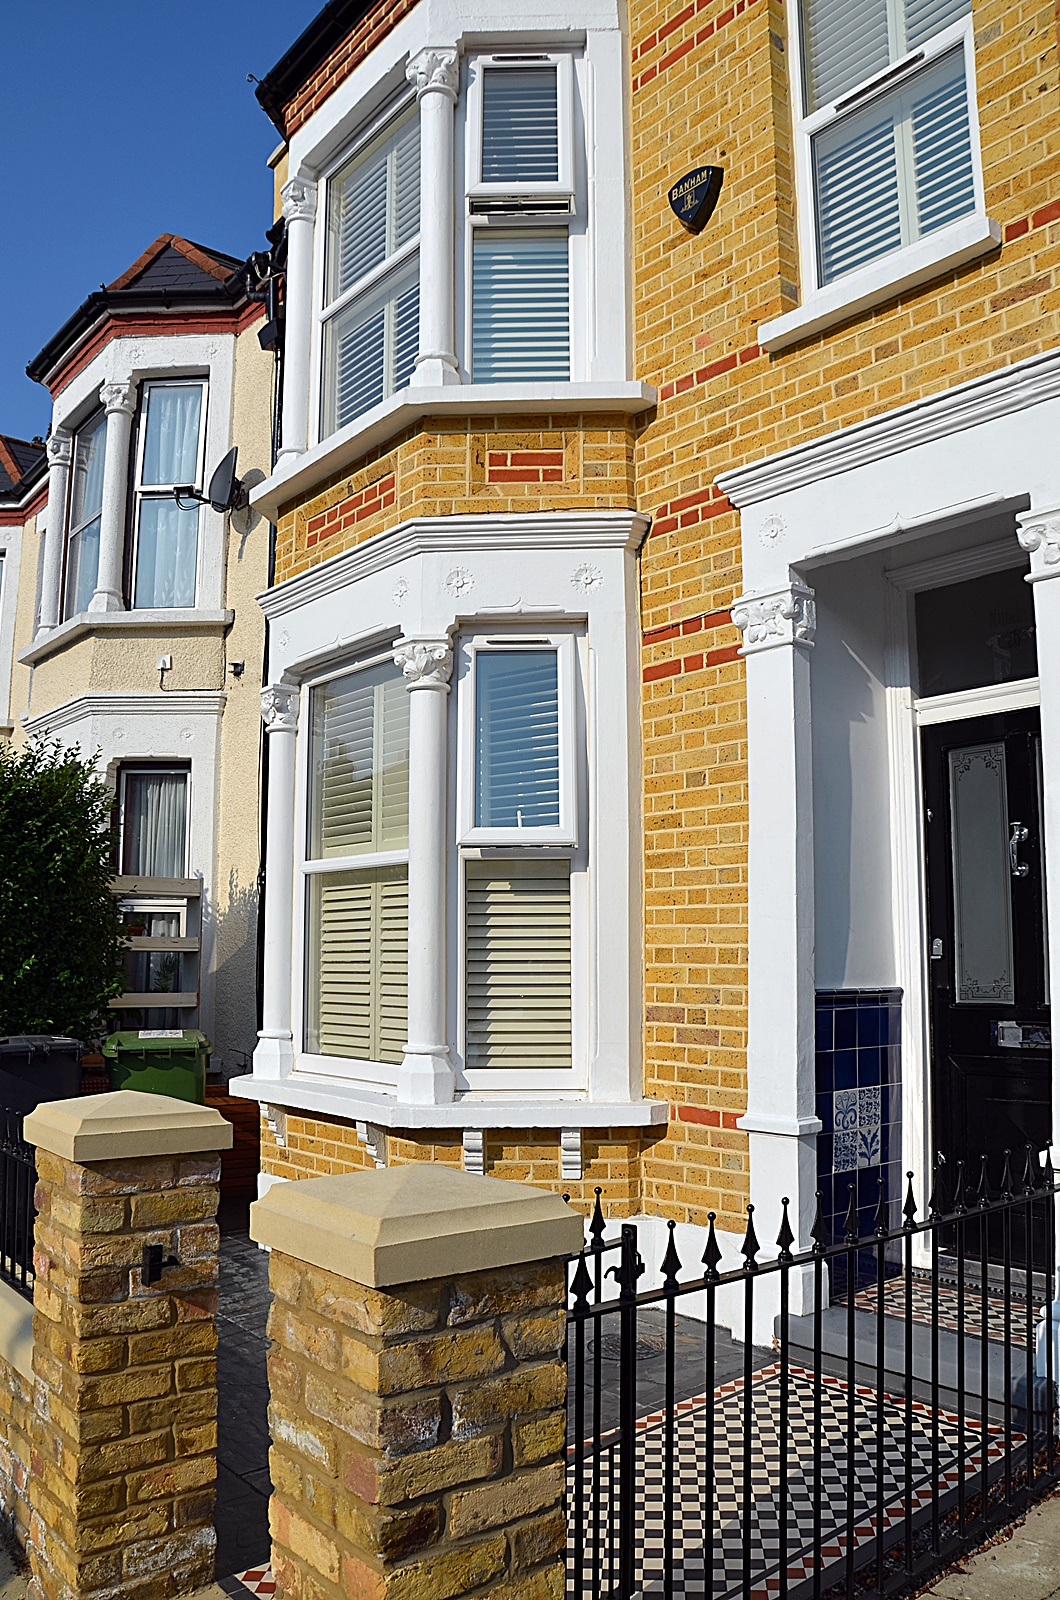 cap-coping-iron-gate-rails-low-mainenance-brick-wall-victorian-mosaic-london-clapham-balham-earsfield